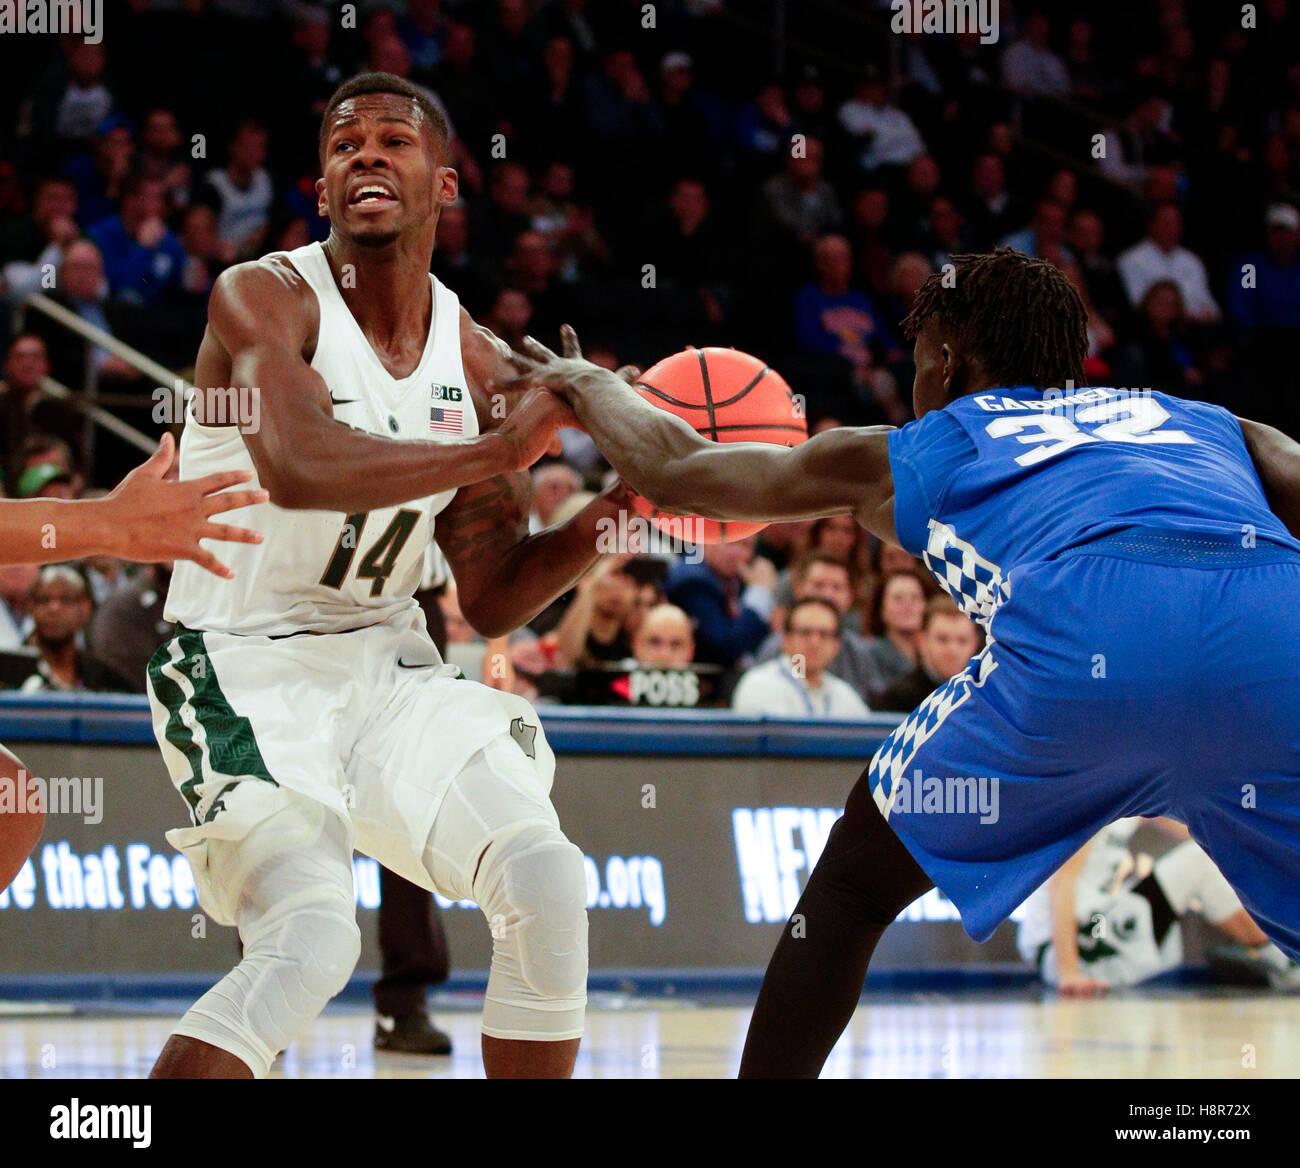 New York, New York, Stati Uniti d'America. Il 23 febbraio, 2016. Kentucky Wildcats avanti Wenyen Gabriel (32) spogliato Foto Stock